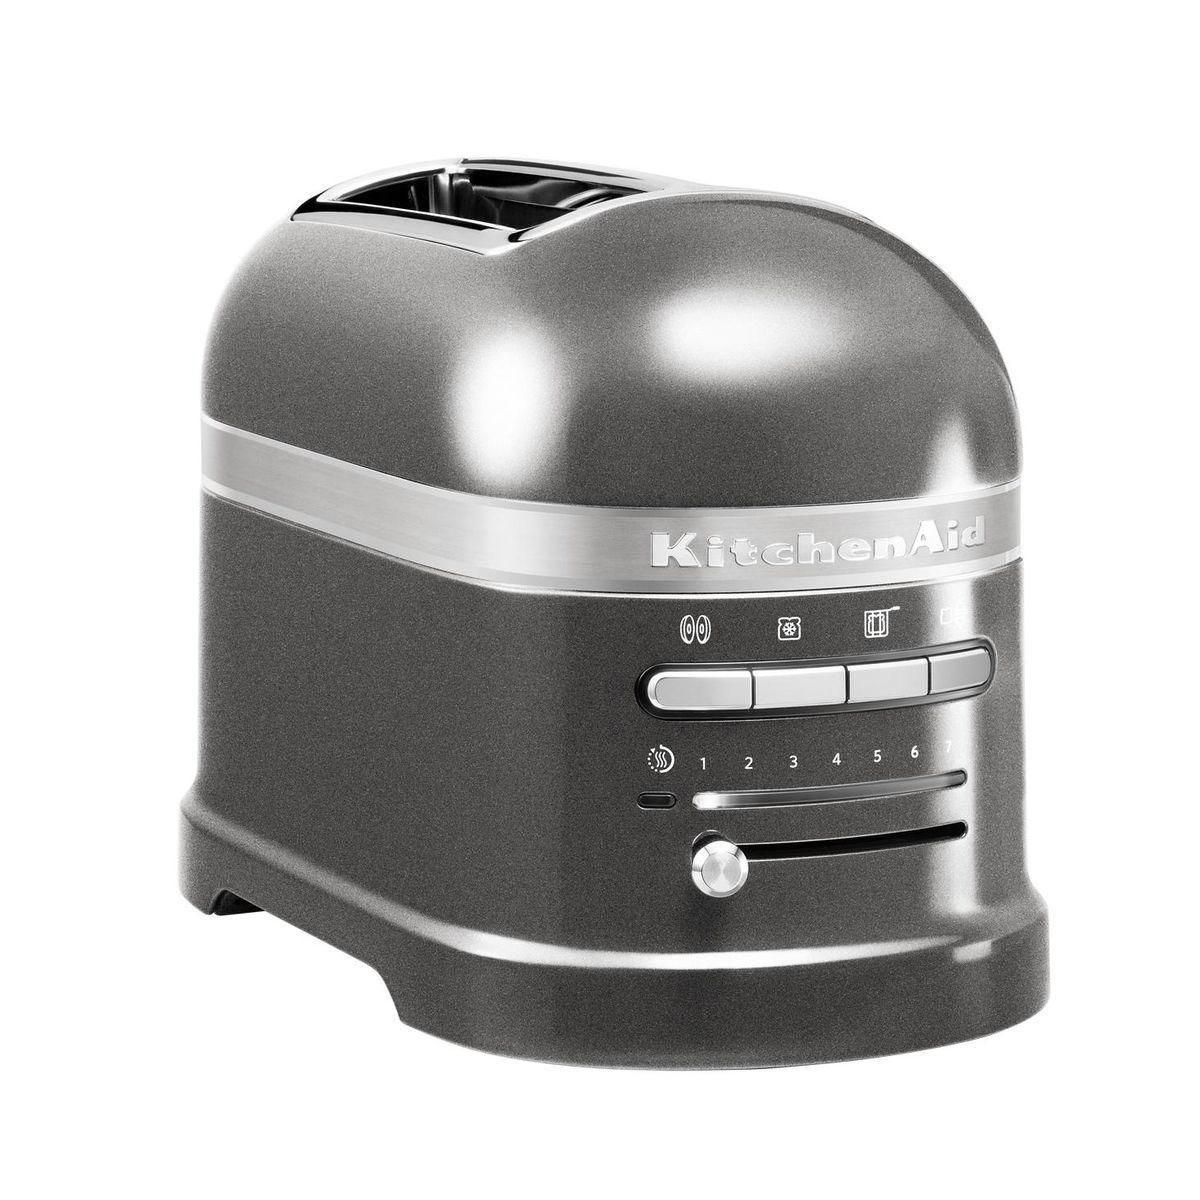 Artisan 5KMT2204 Toaster 2 slices | KitchenAid